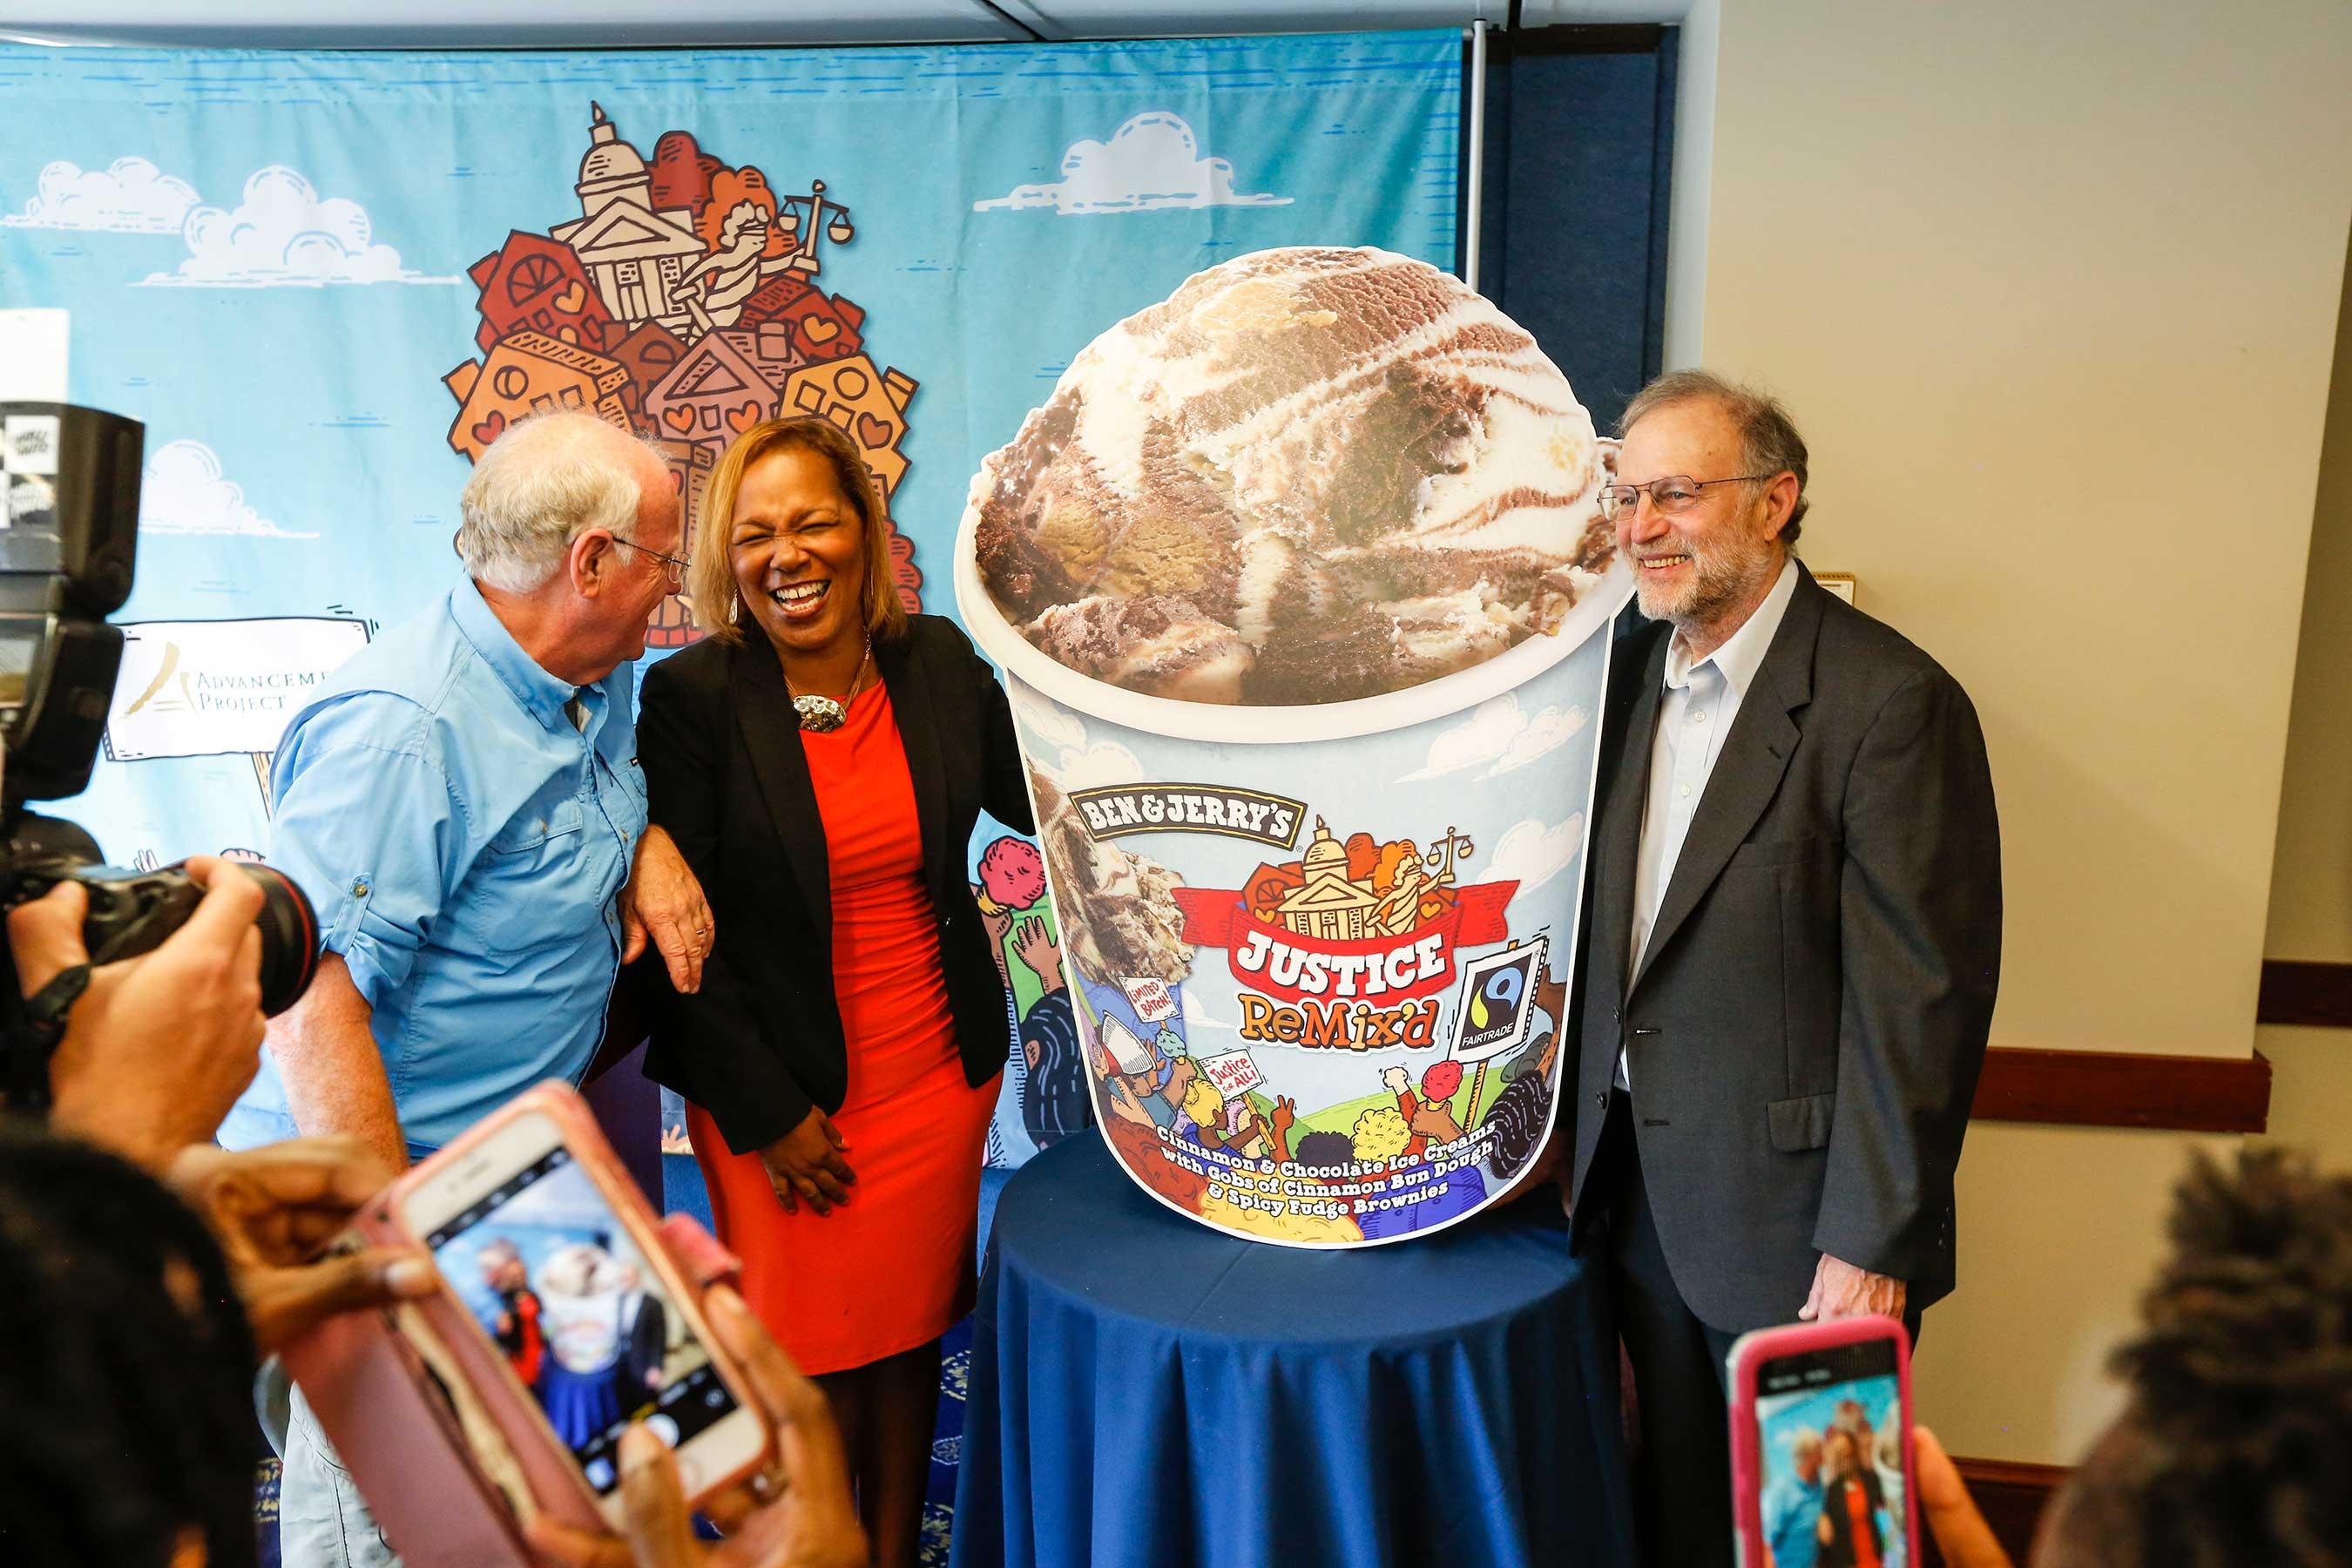 Ben & Jerry's new flavor spotlights criminal justice reform